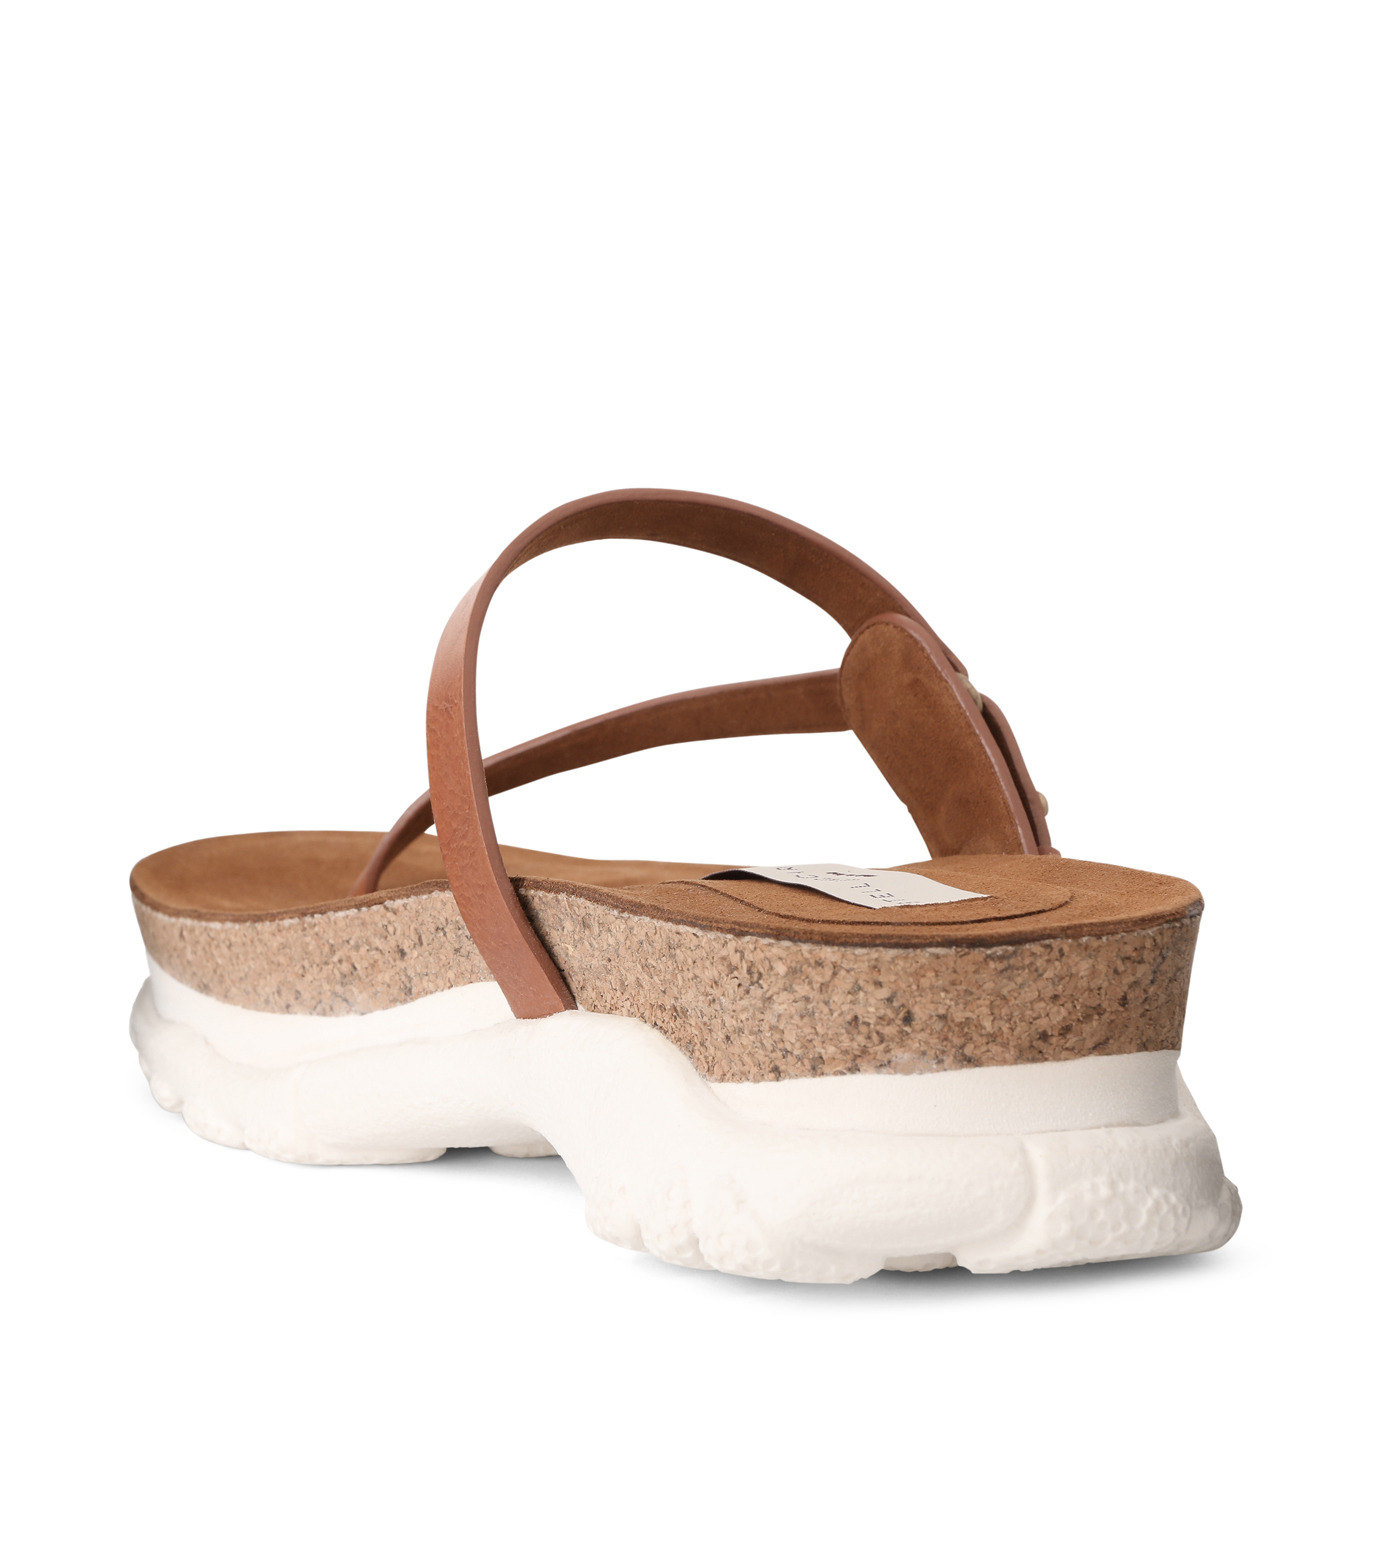 Stella McCartney(ステラマッカートニー)のSneaker Sandal-BROWN(シューズ/shoes)-423387-W0MW0-42 拡大詳細画像2